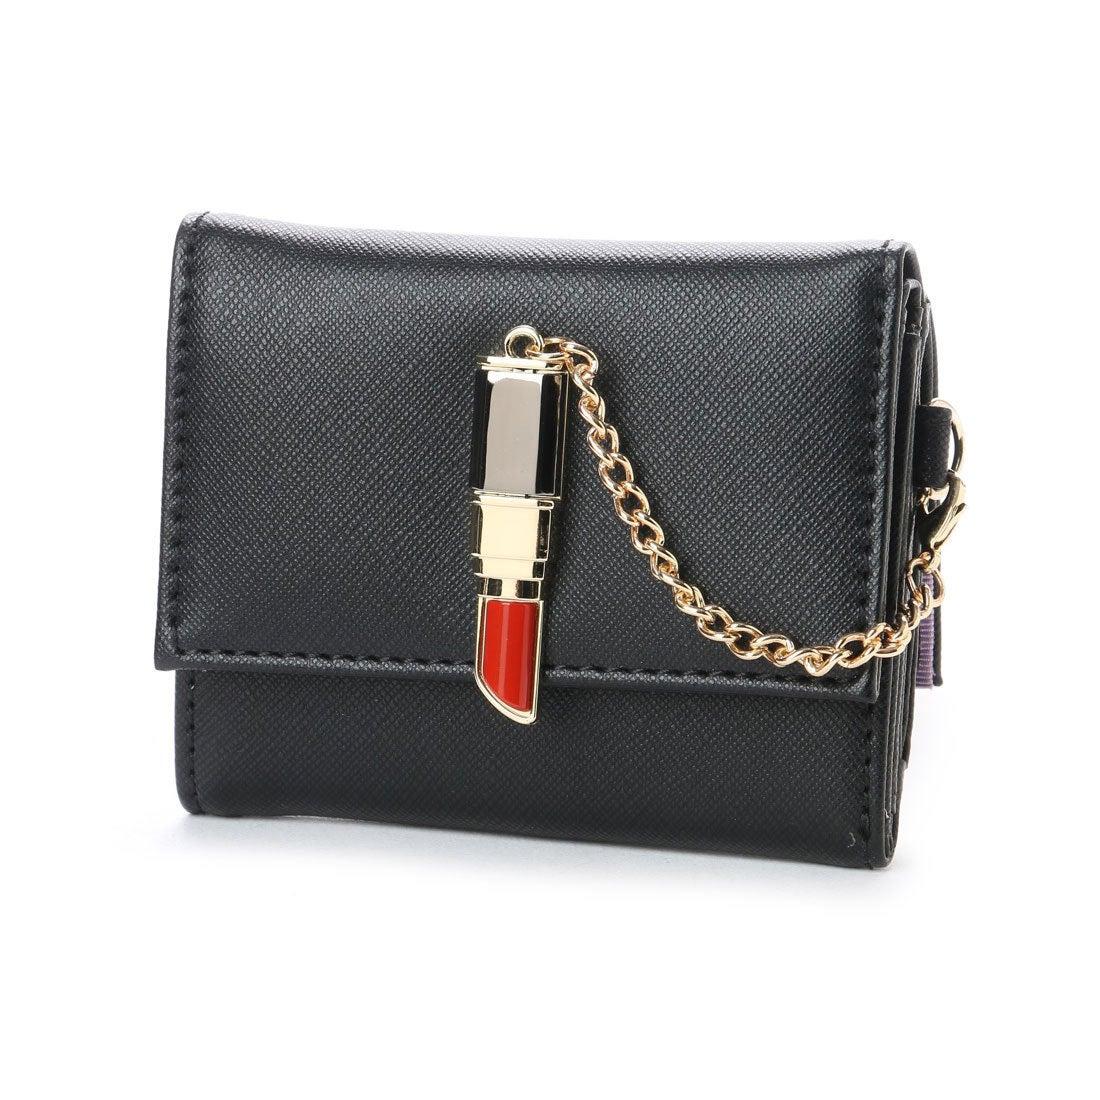 e2ae3c381c14 スパイラルガール SPIRAL GIRL 口紅型金具付き折財布 (ブラック) -靴&ファッション通販 ロコンド〜自宅で試着、気軽に返品